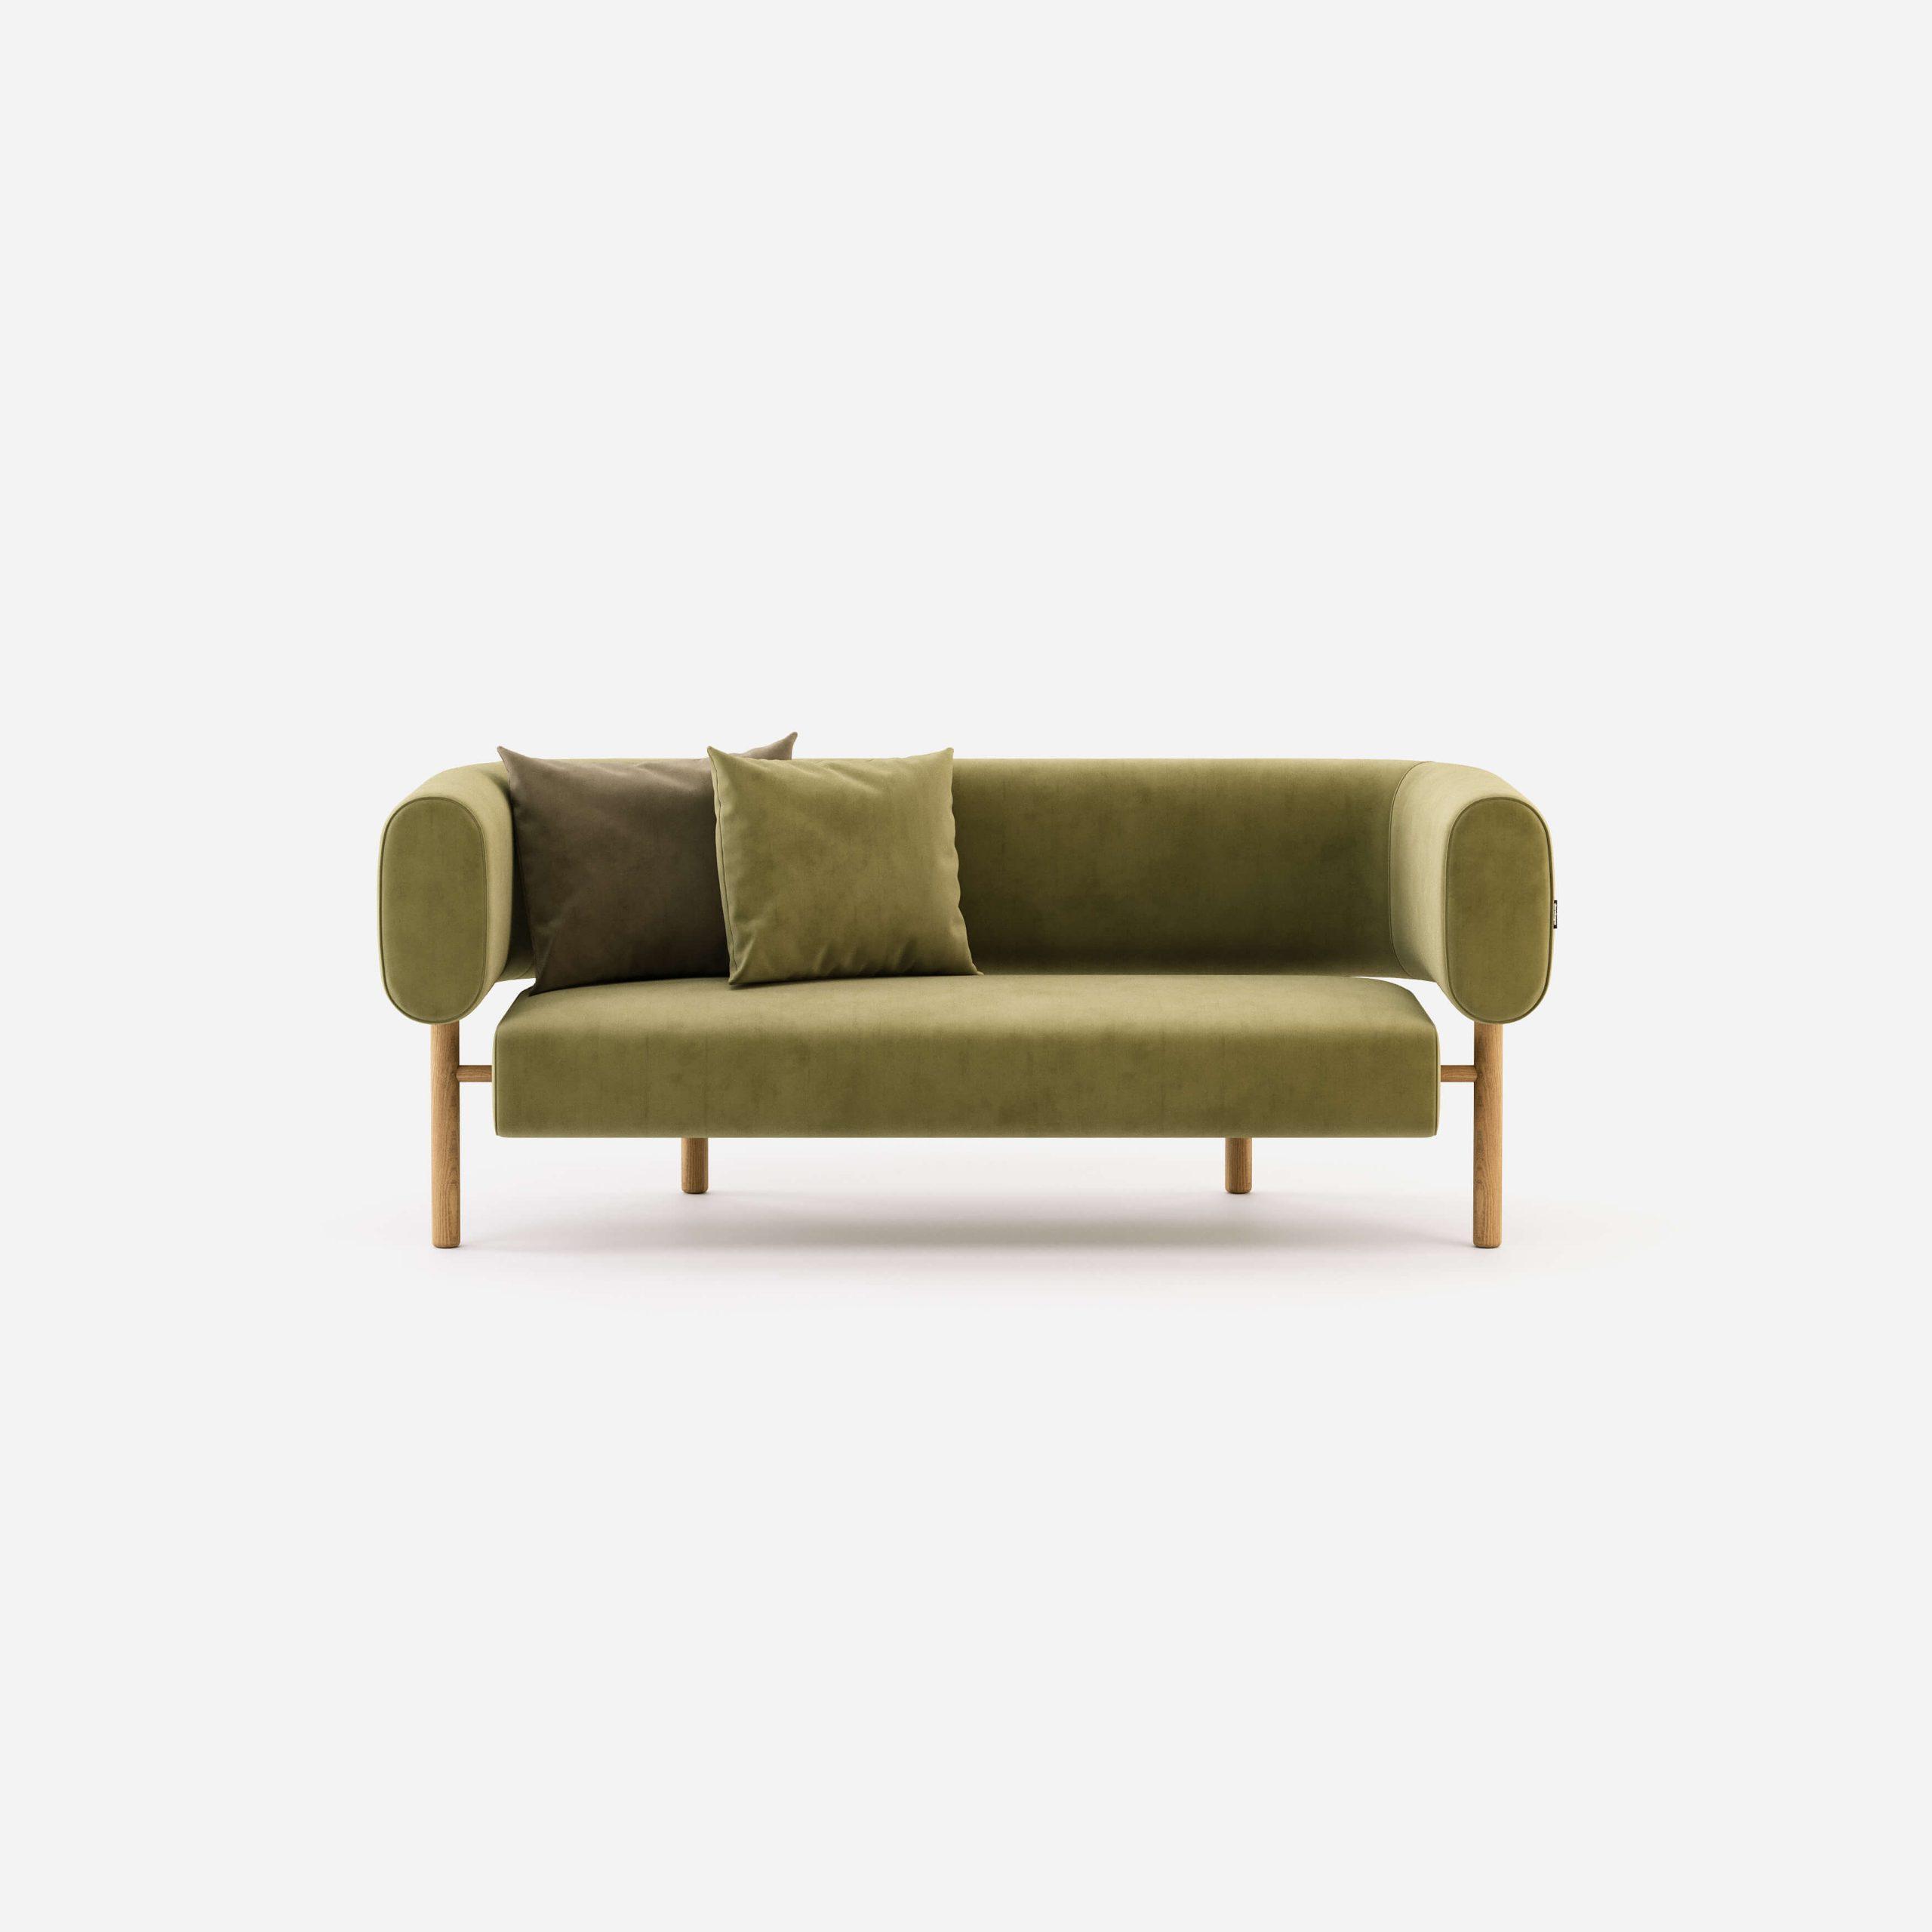 Nook Sofa By Domkapa Living Rooms